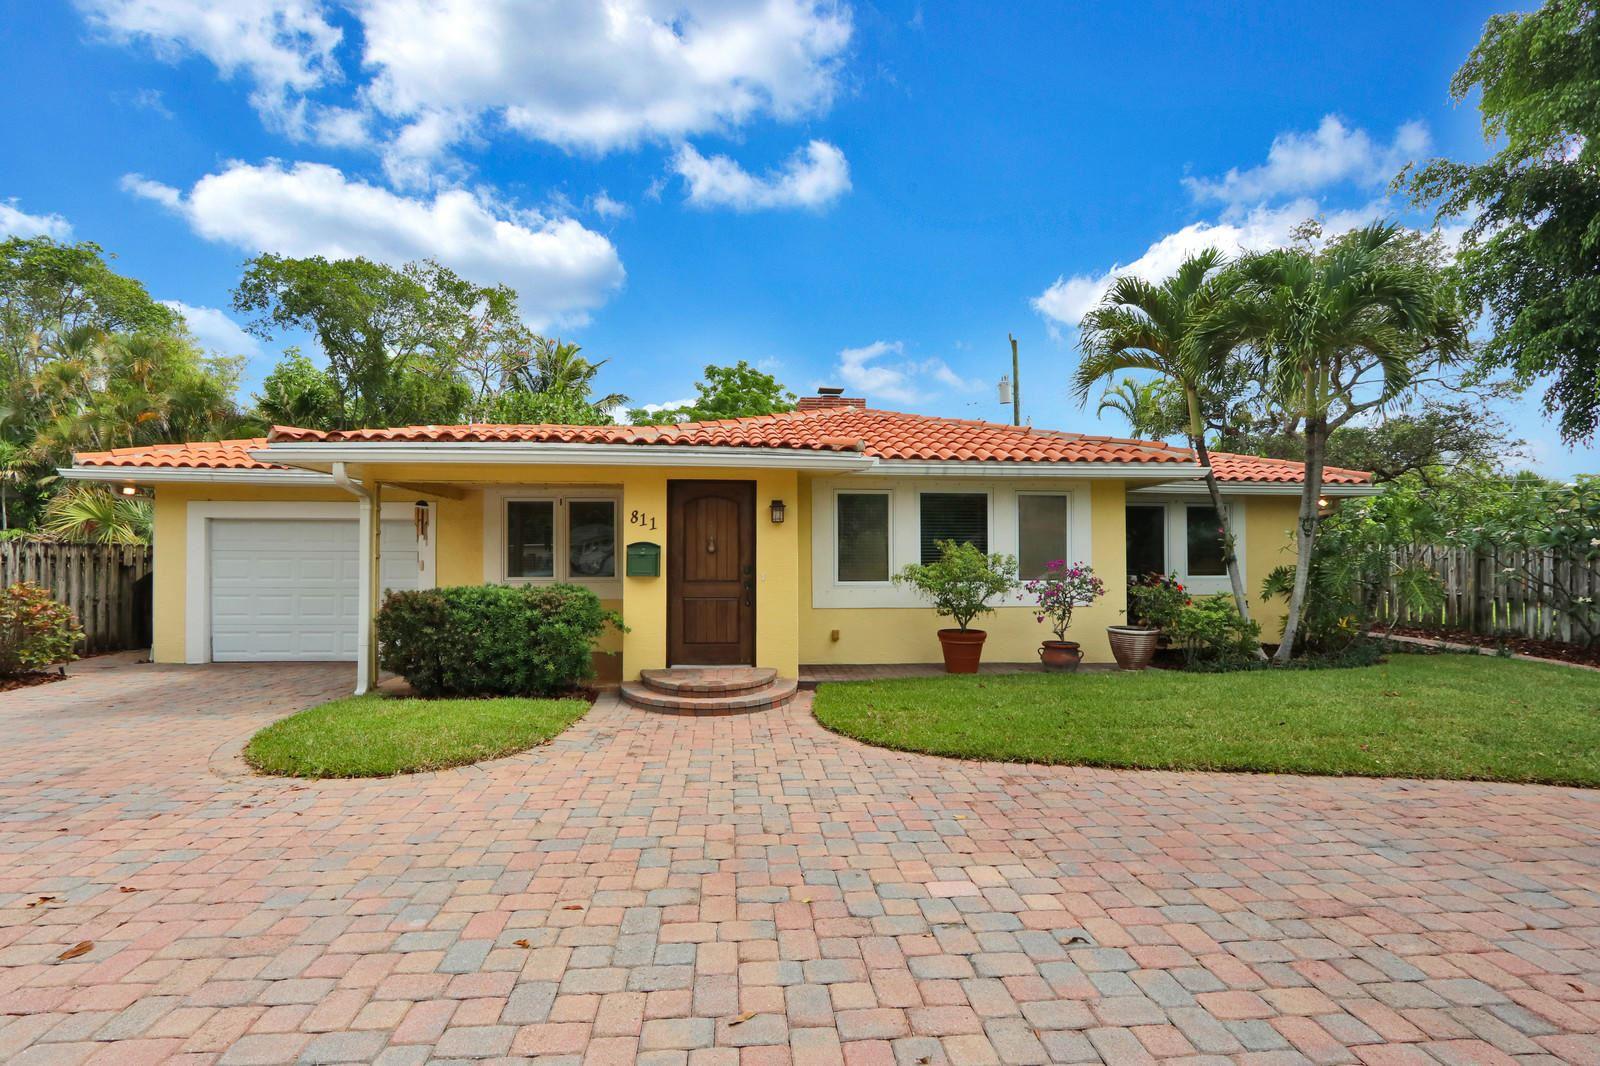 811 Forest Hill Boulevard, West Palm Beach, FL 33405 - #: RX-10625901